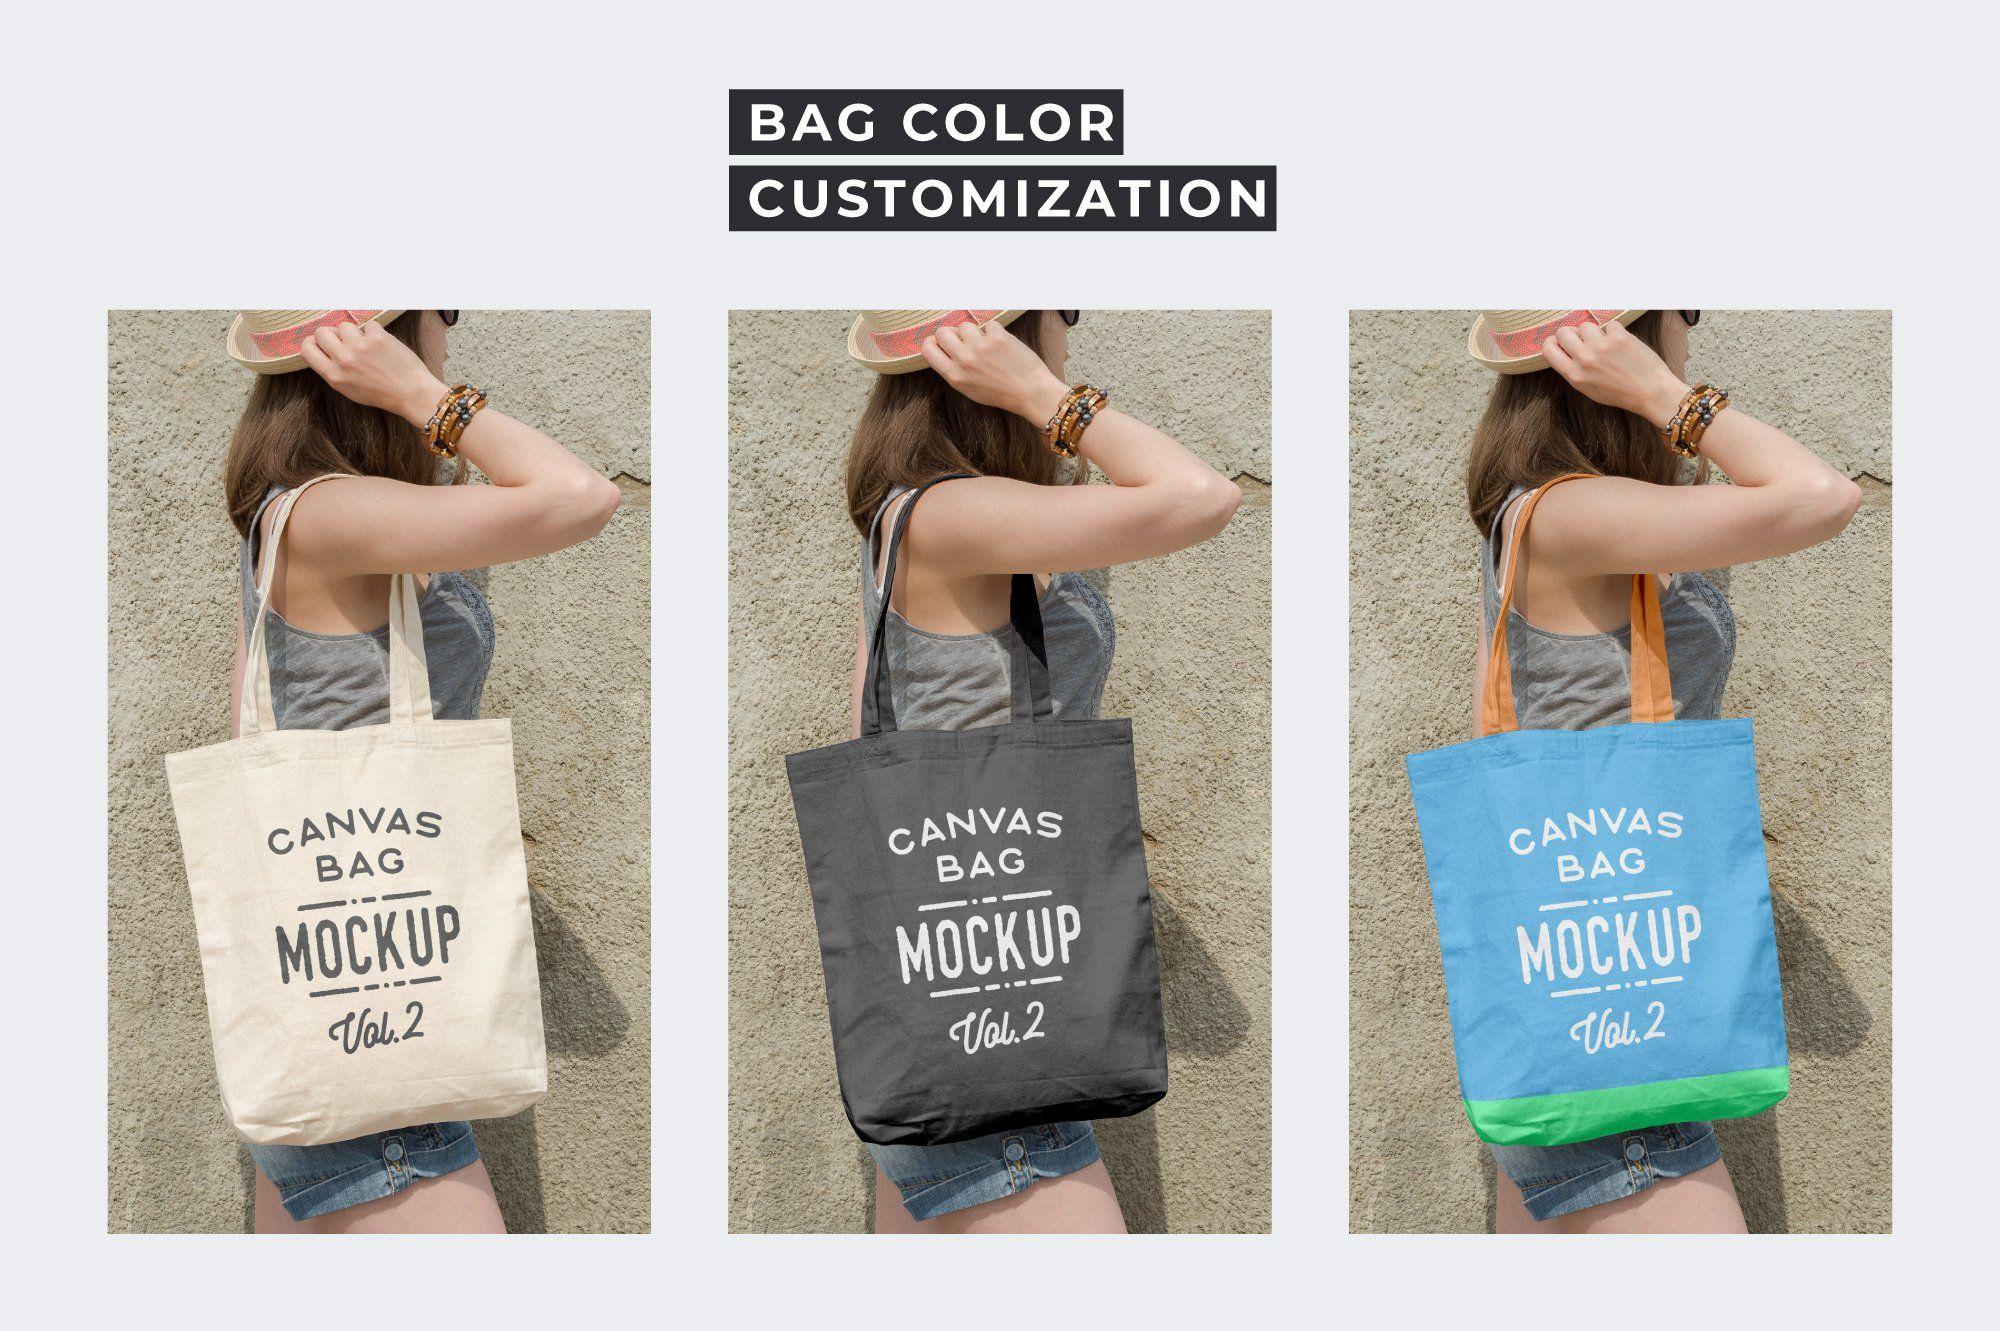 Canvas Tote Bag Mockups Pack Vol 2 Bag Mockup Tote Bag Canvas Tote Bags